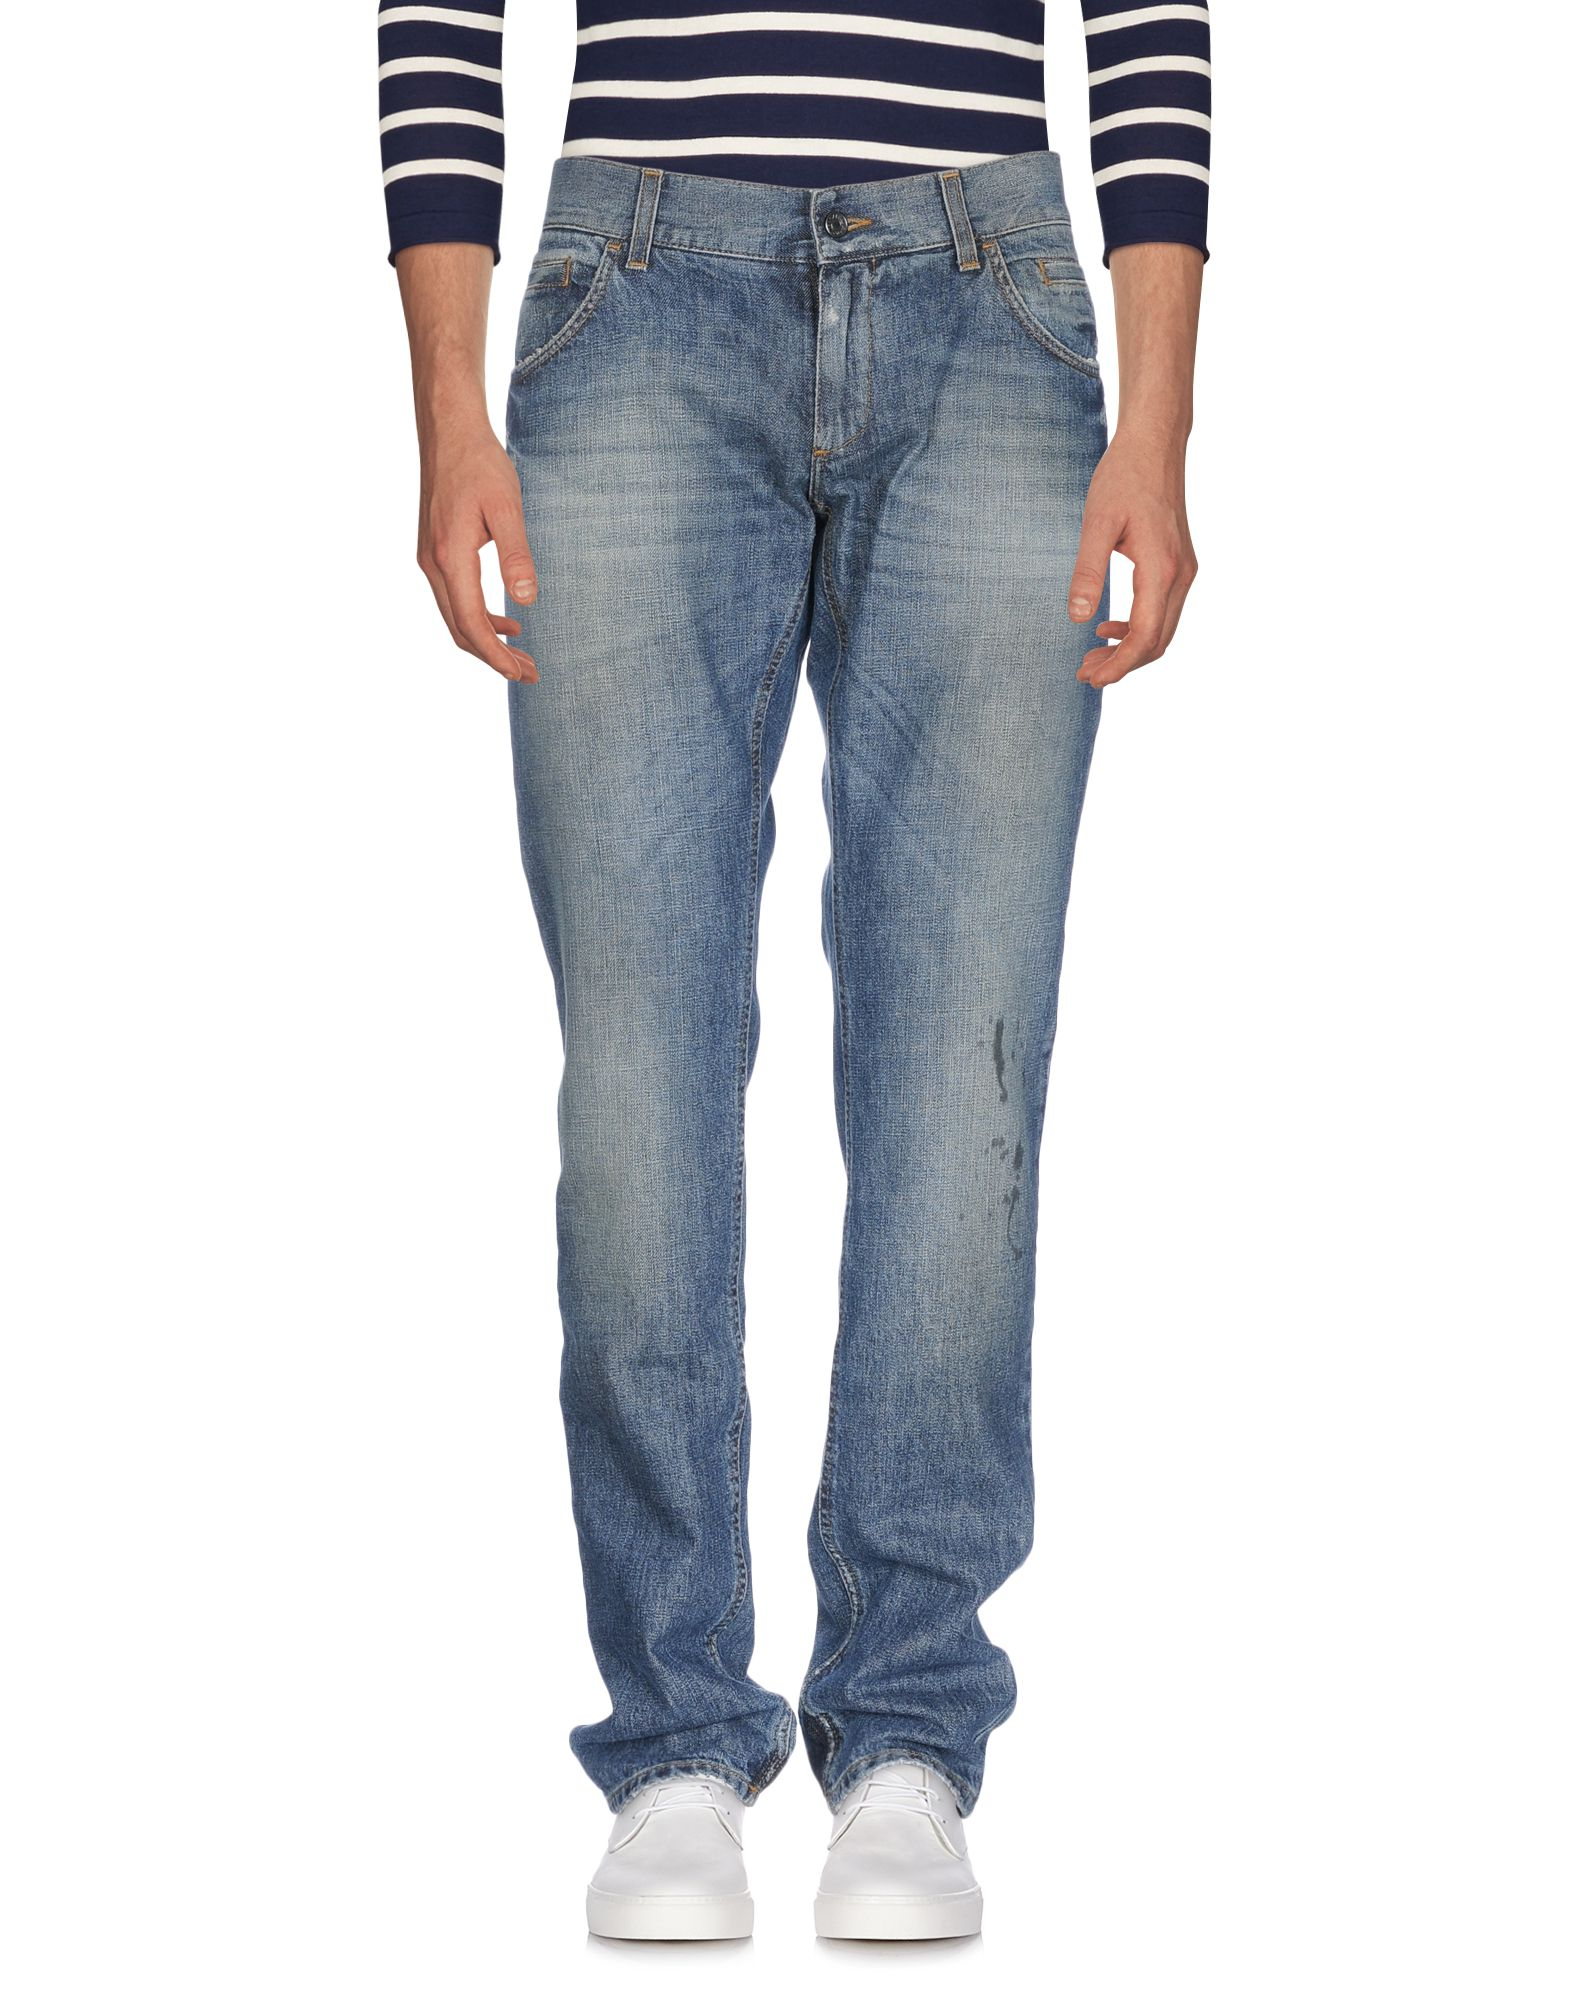 Pantaloni Pantaloni Pantaloni Jeans Dolce & Gabbana Uomo - 42655631QB 83a47b